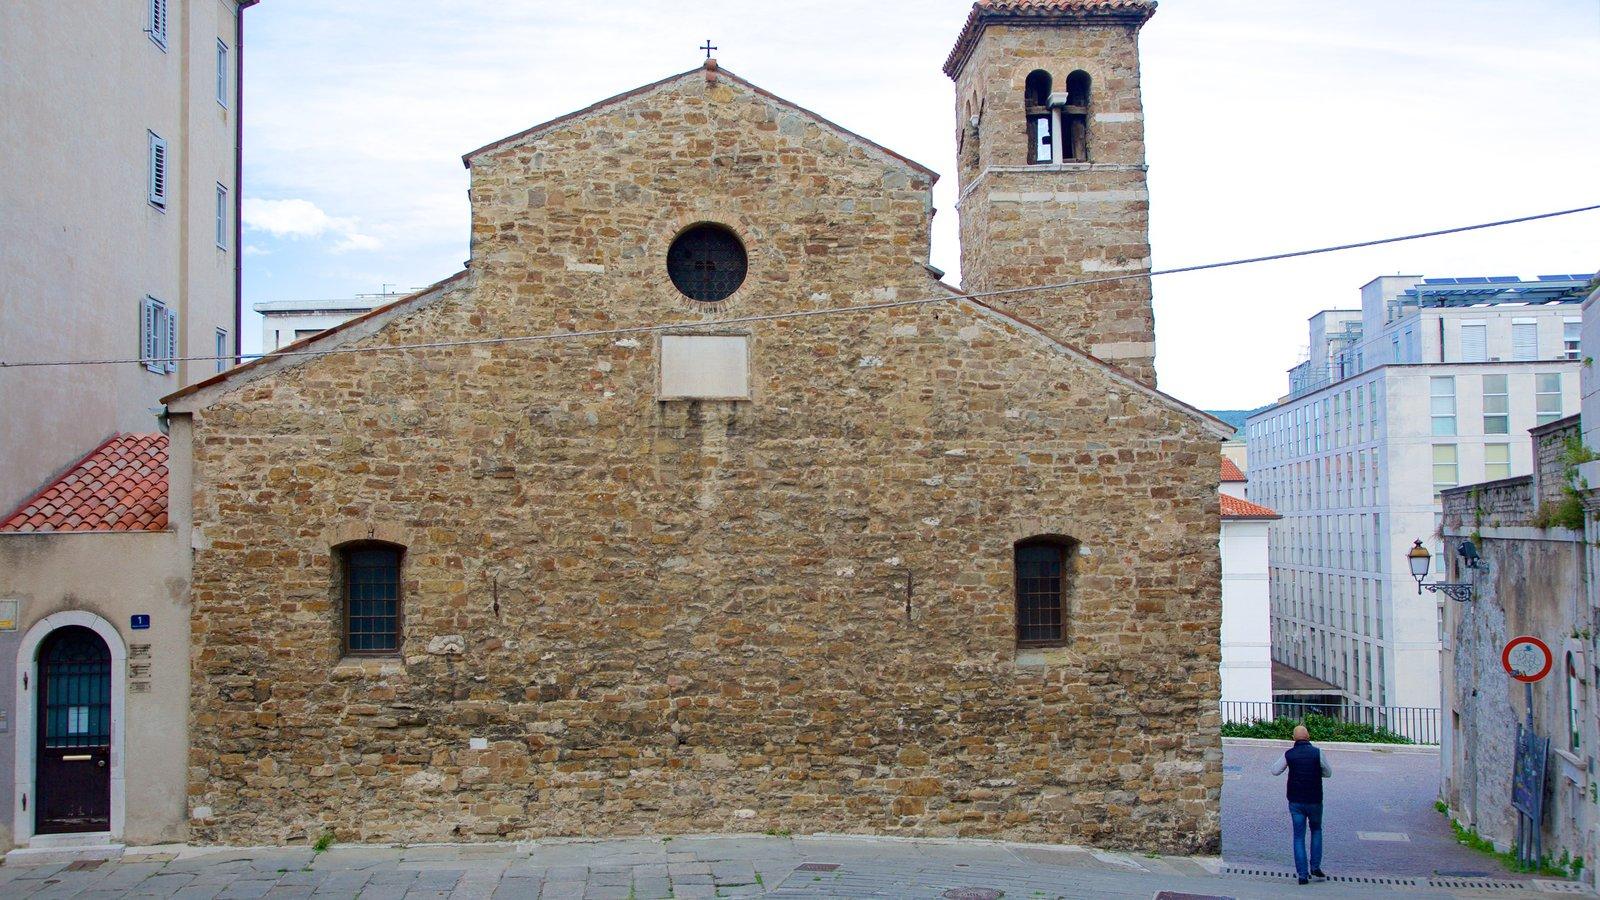 Basilica Paleocristiana featuring heritage architecture